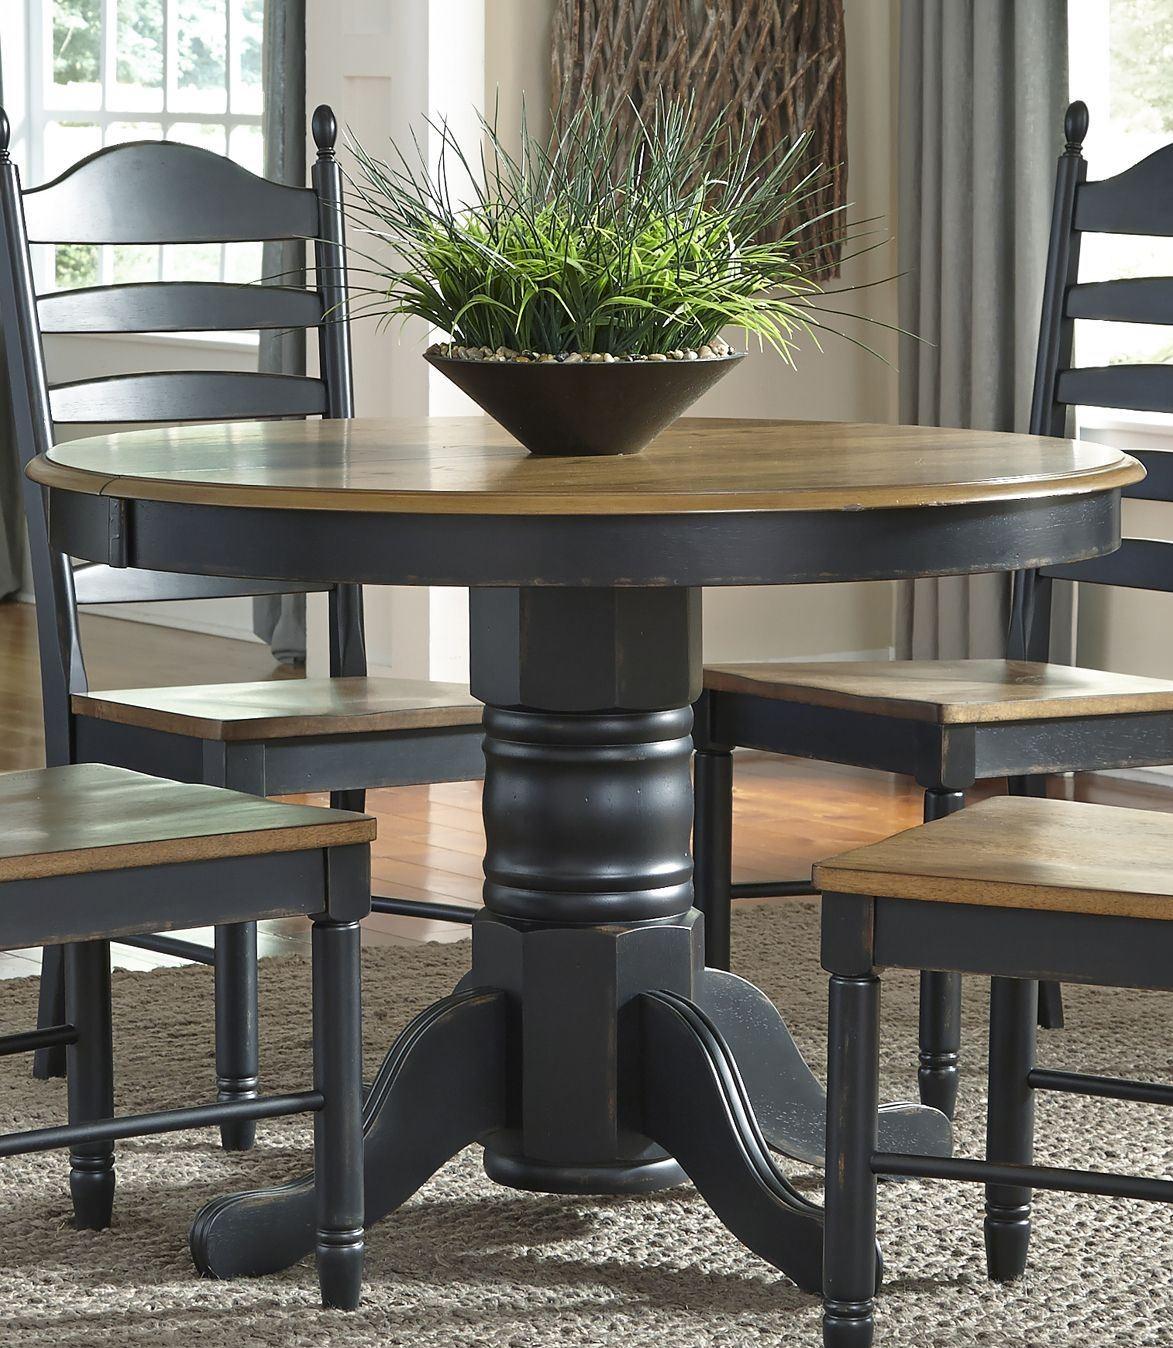 Liberty Furniture Springfield 7 Piece Pedestal Table Set: Springfield II Honey And Black Extendable Pedestal Dining